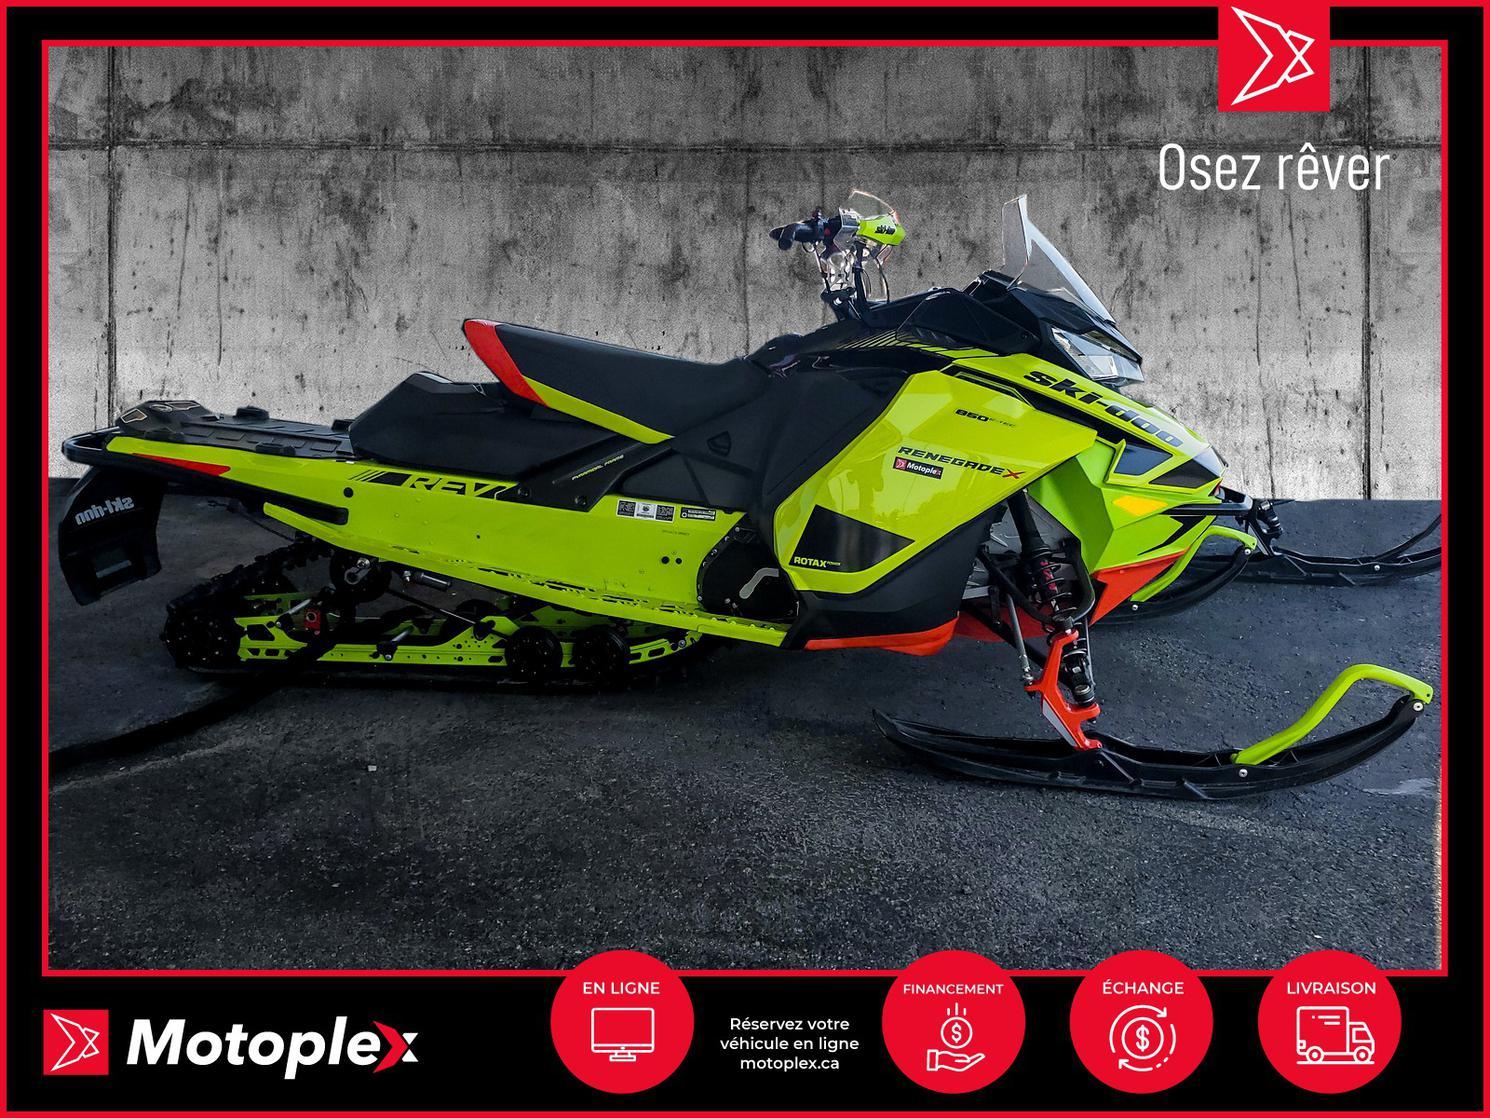 2020 Ski-Doo RENEGADE 850 X 46$/semaine